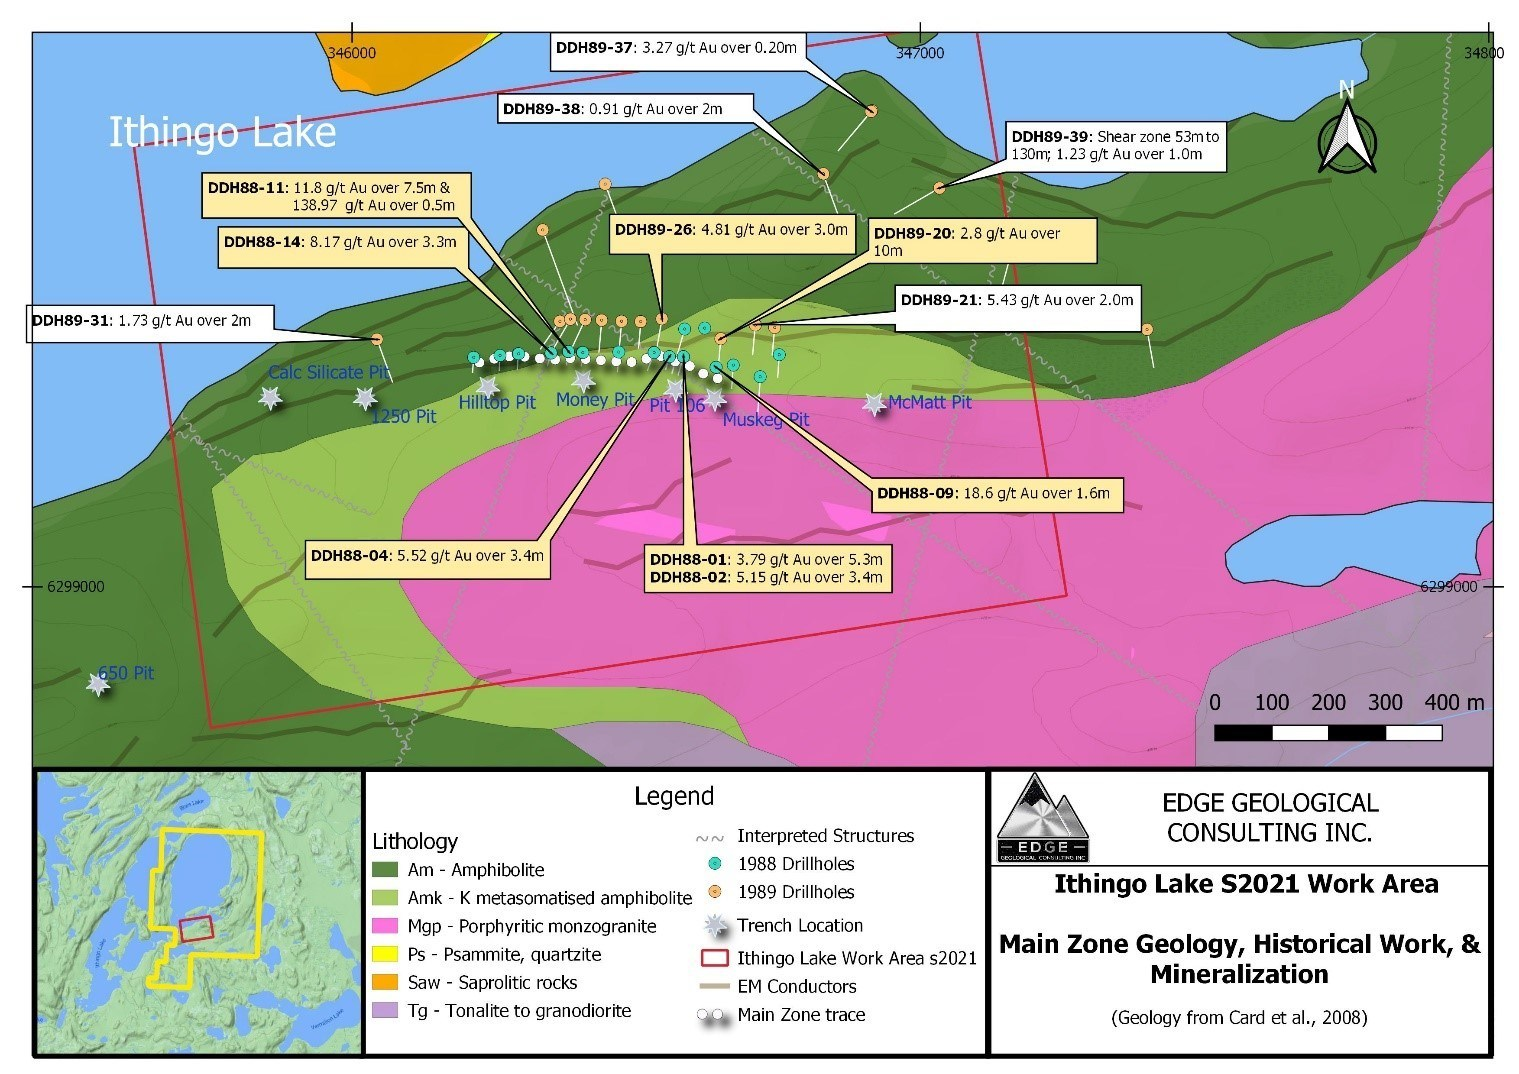 Inthingo Lake S2021 Work Area - Main Zone Geology, Historical Work, & Mineralization (CNW Group/SKRR Exploration Inc.)